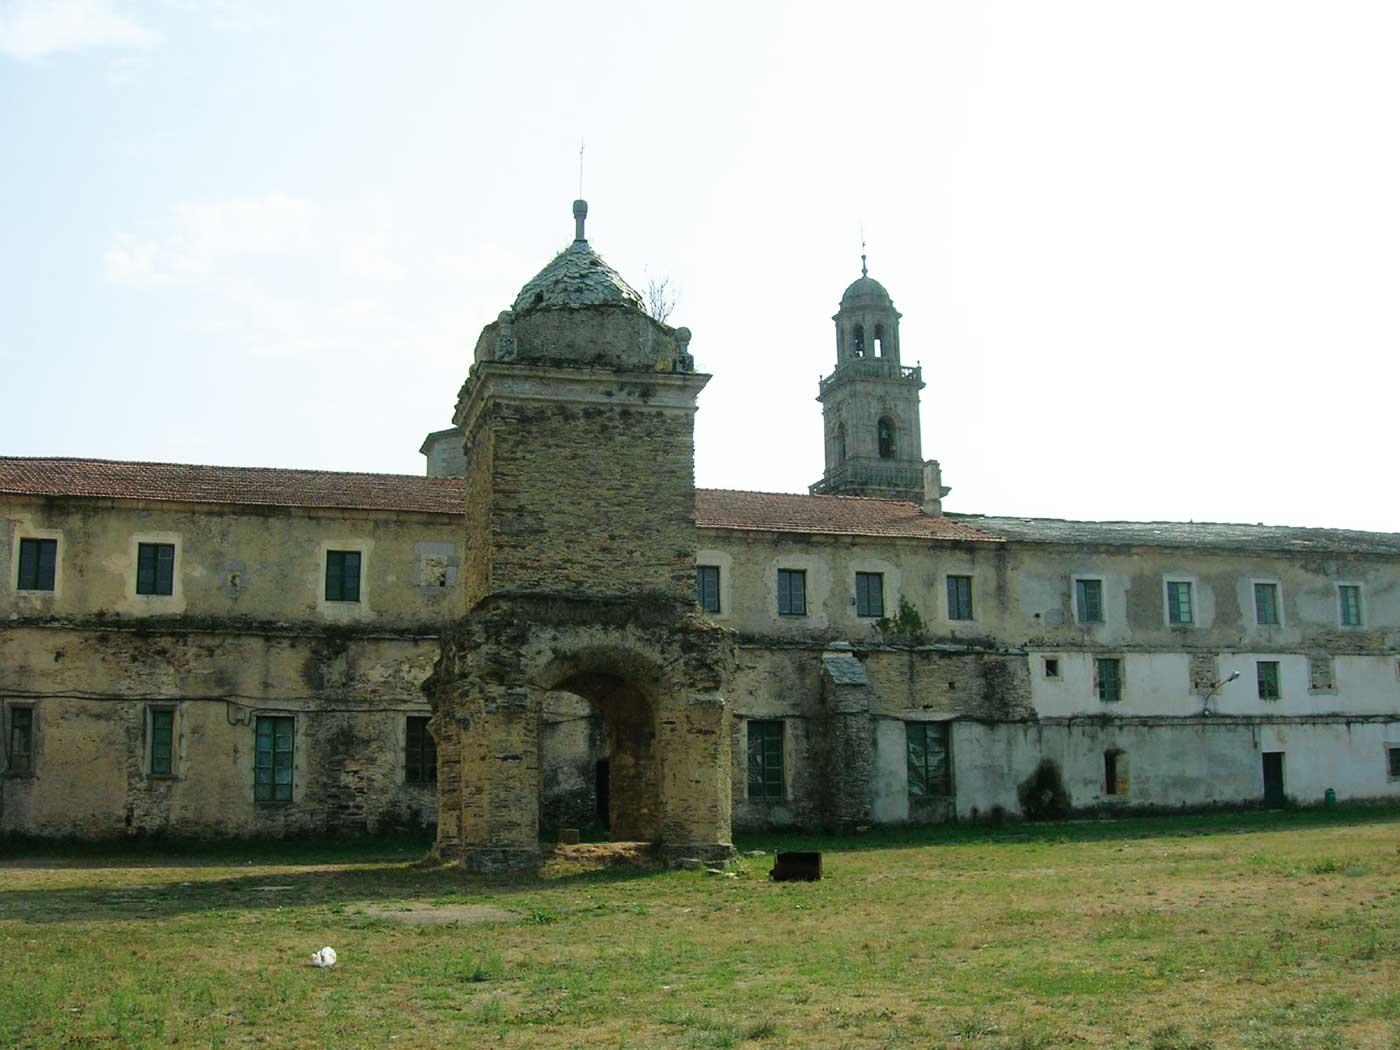 VILANOVA-DE-LOURENZA_03_Monasterio-de-S.Salvador-de-Lourenza_Foto.Gil.Mnez.jpg